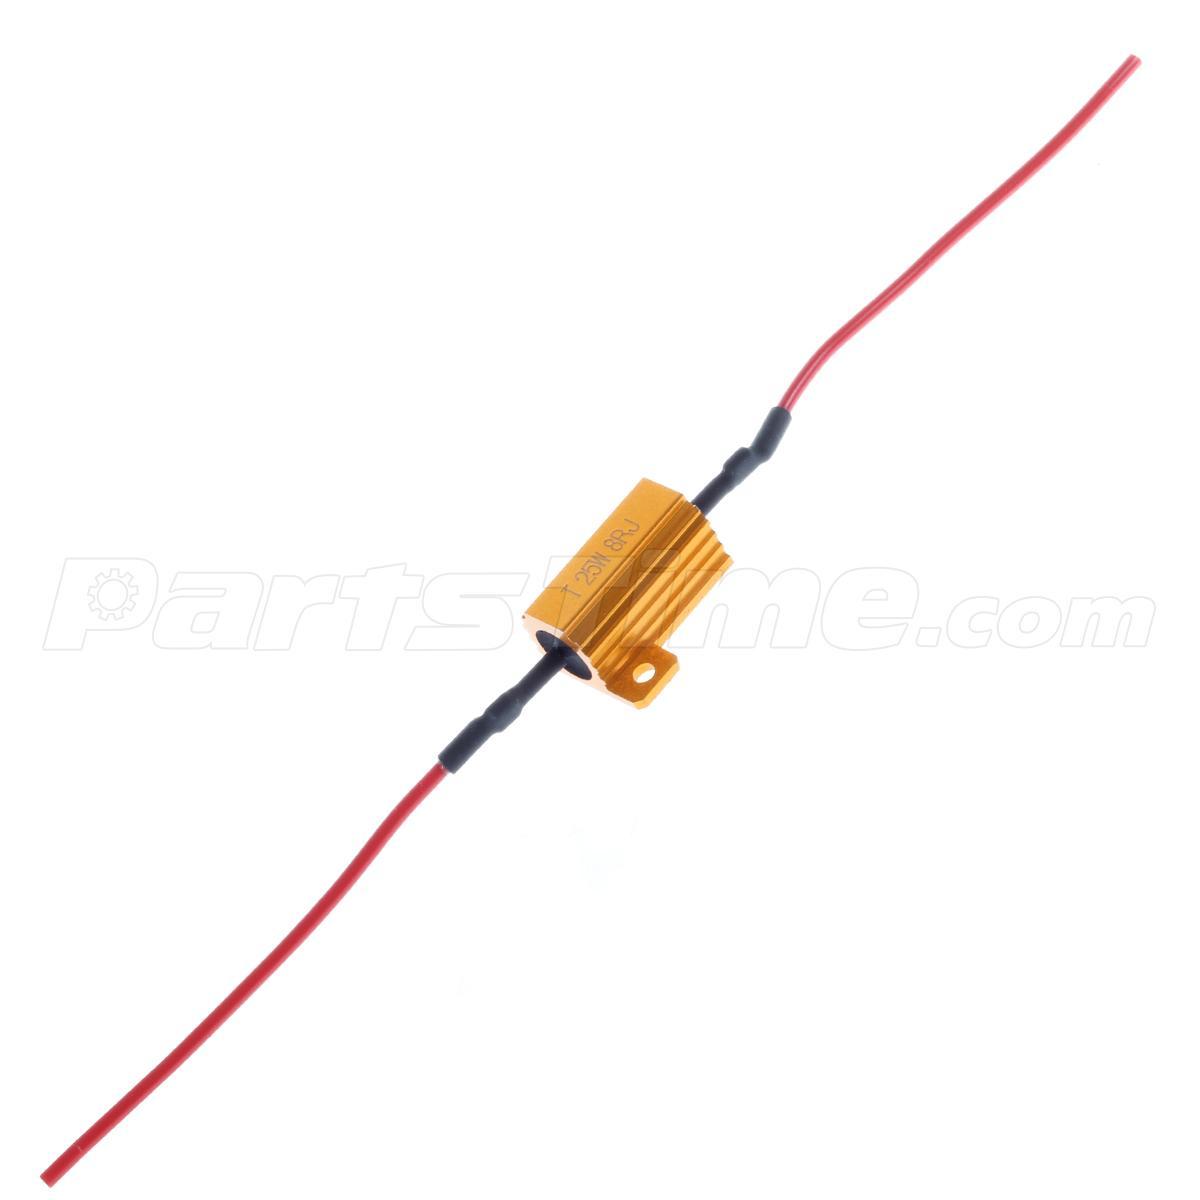 c5 corvette turn signal wiring diagram  c5  get free image